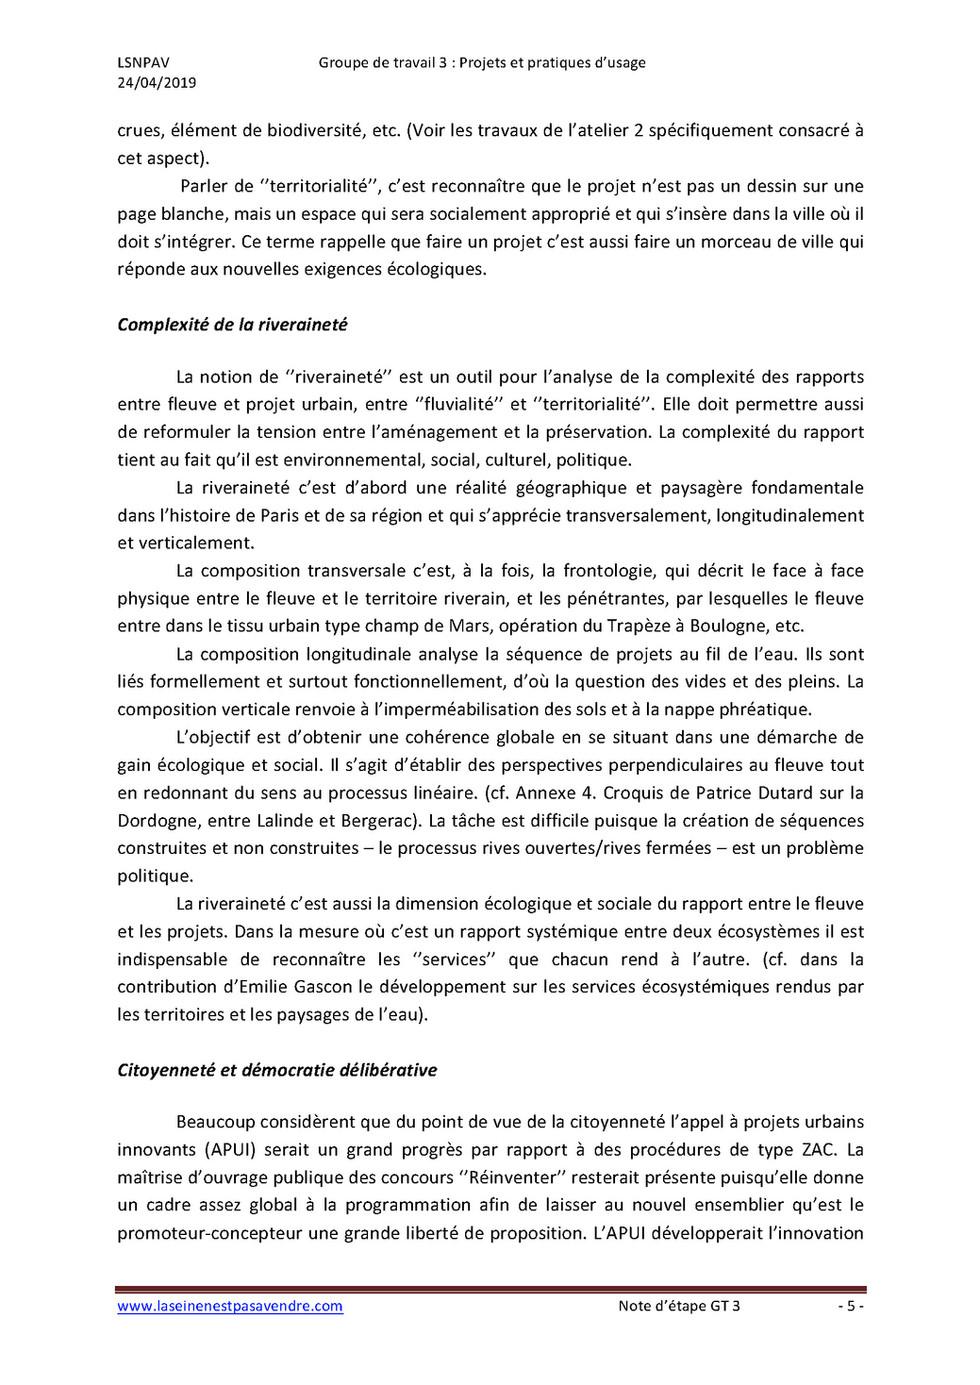 GT 3 Note d'étape_Page_05.jpg